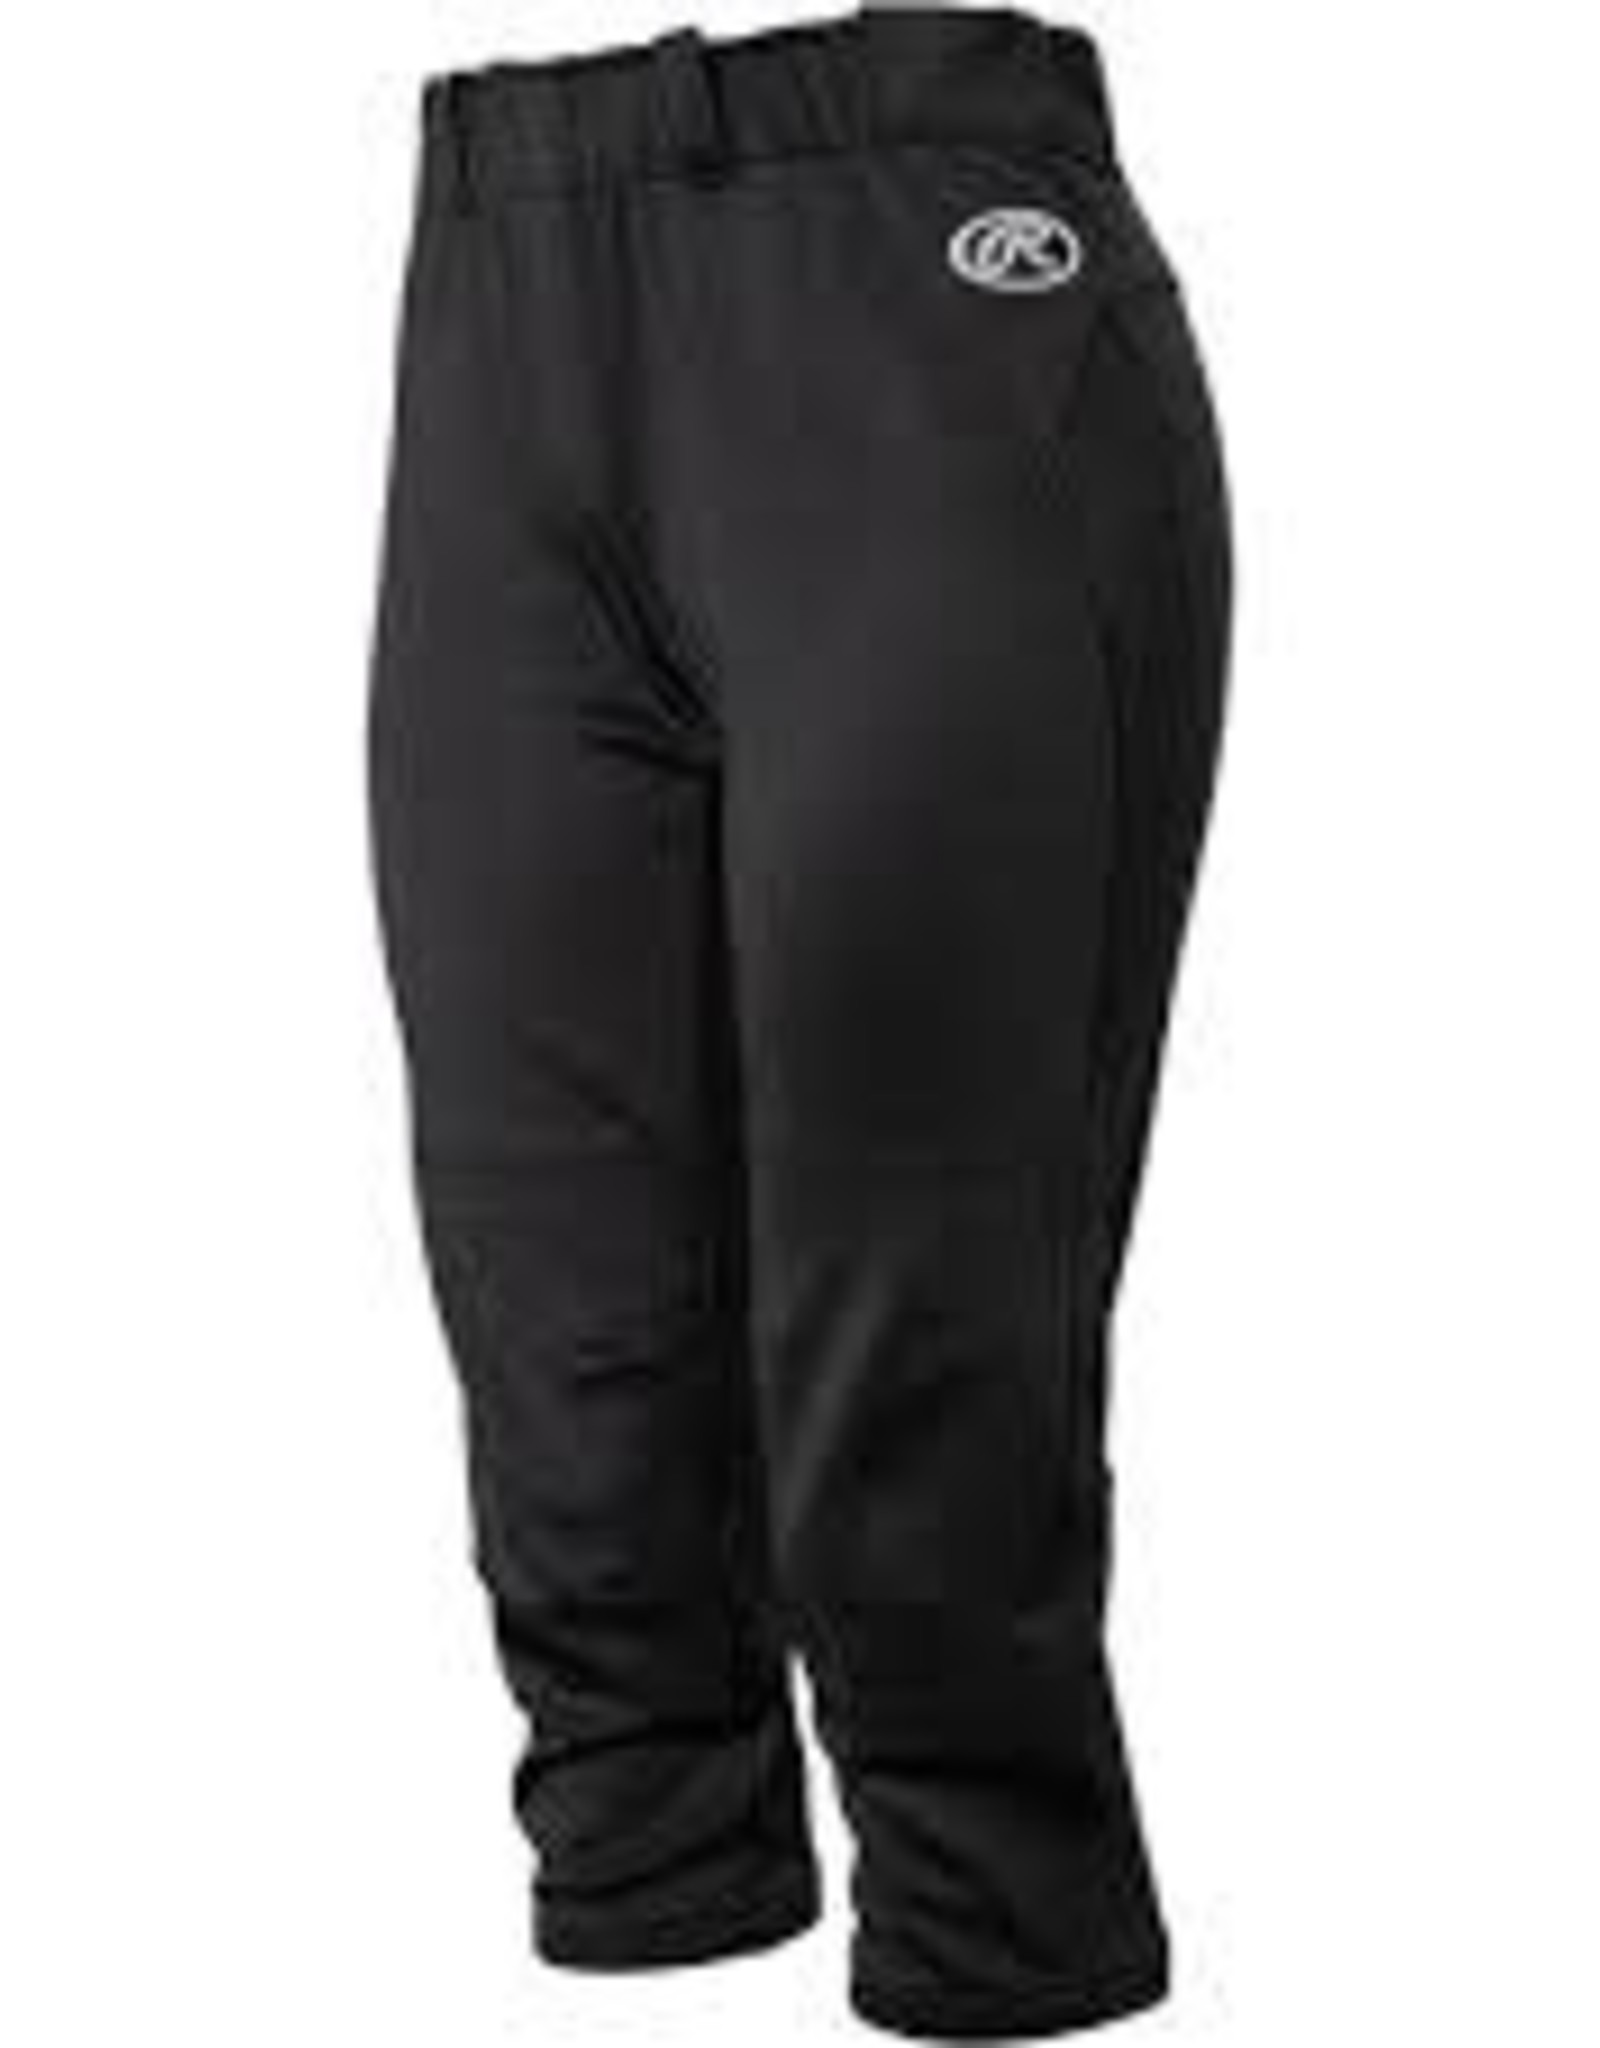 Rawlings Pants Baseball Women No Zip Yoga M